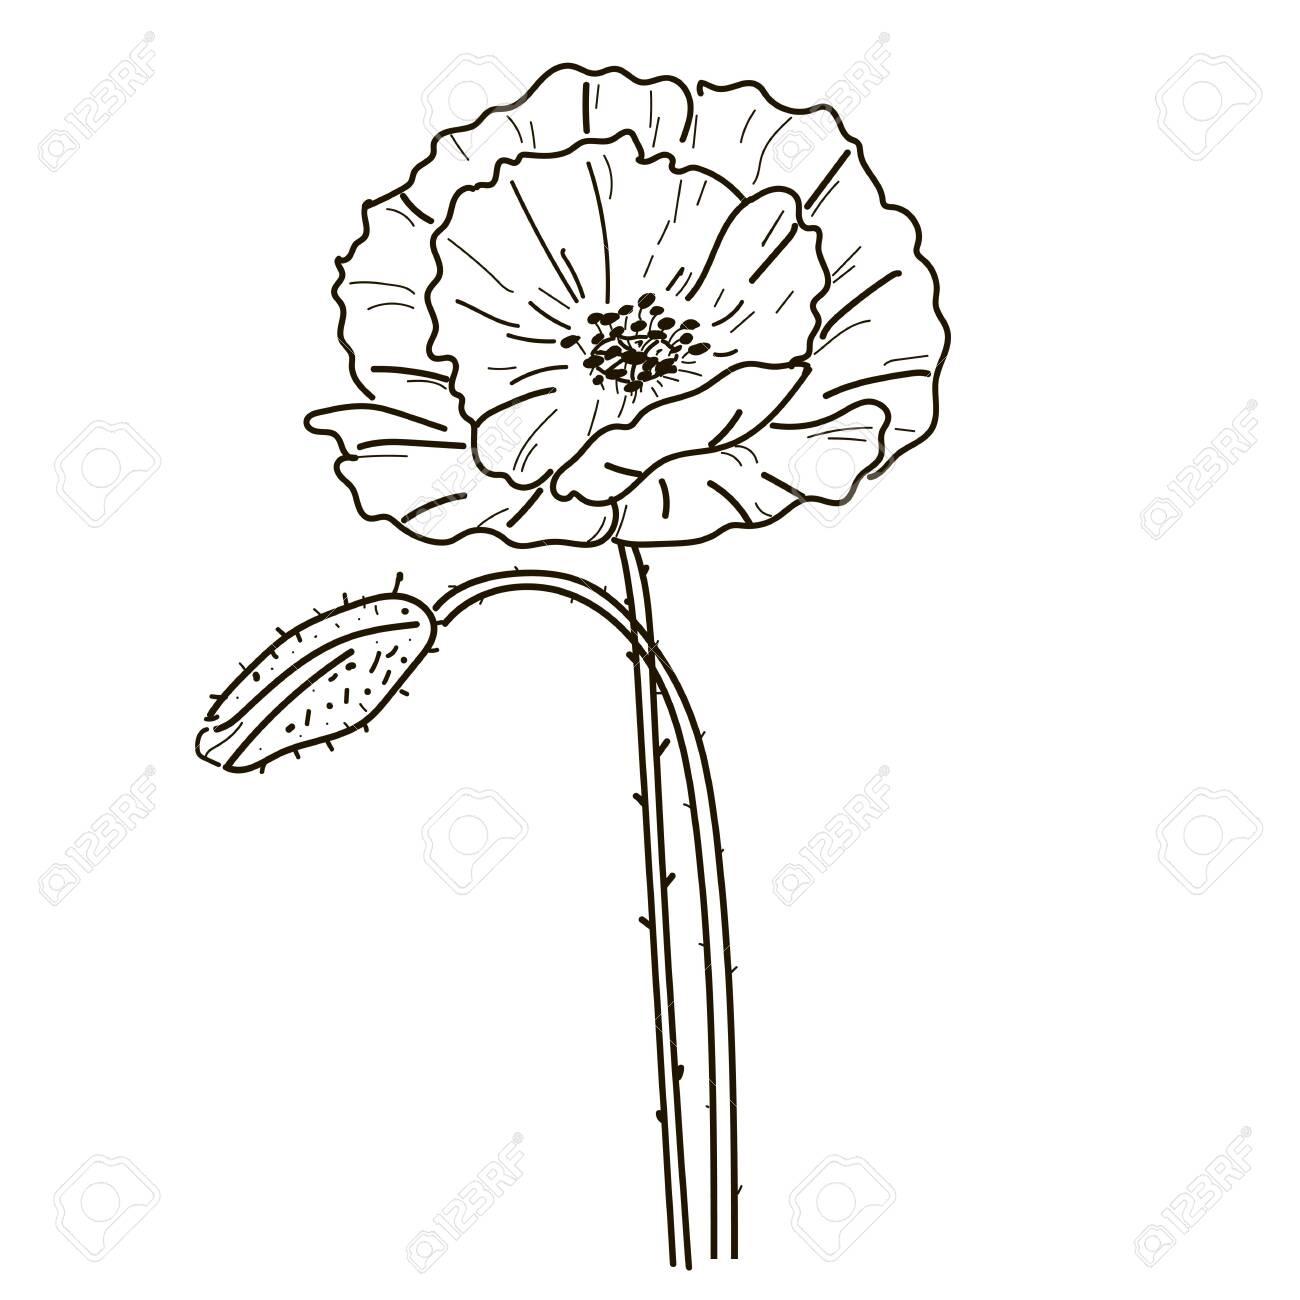 Poppy Wildflowers Line Art Flower Drawing Illustration Black On ...